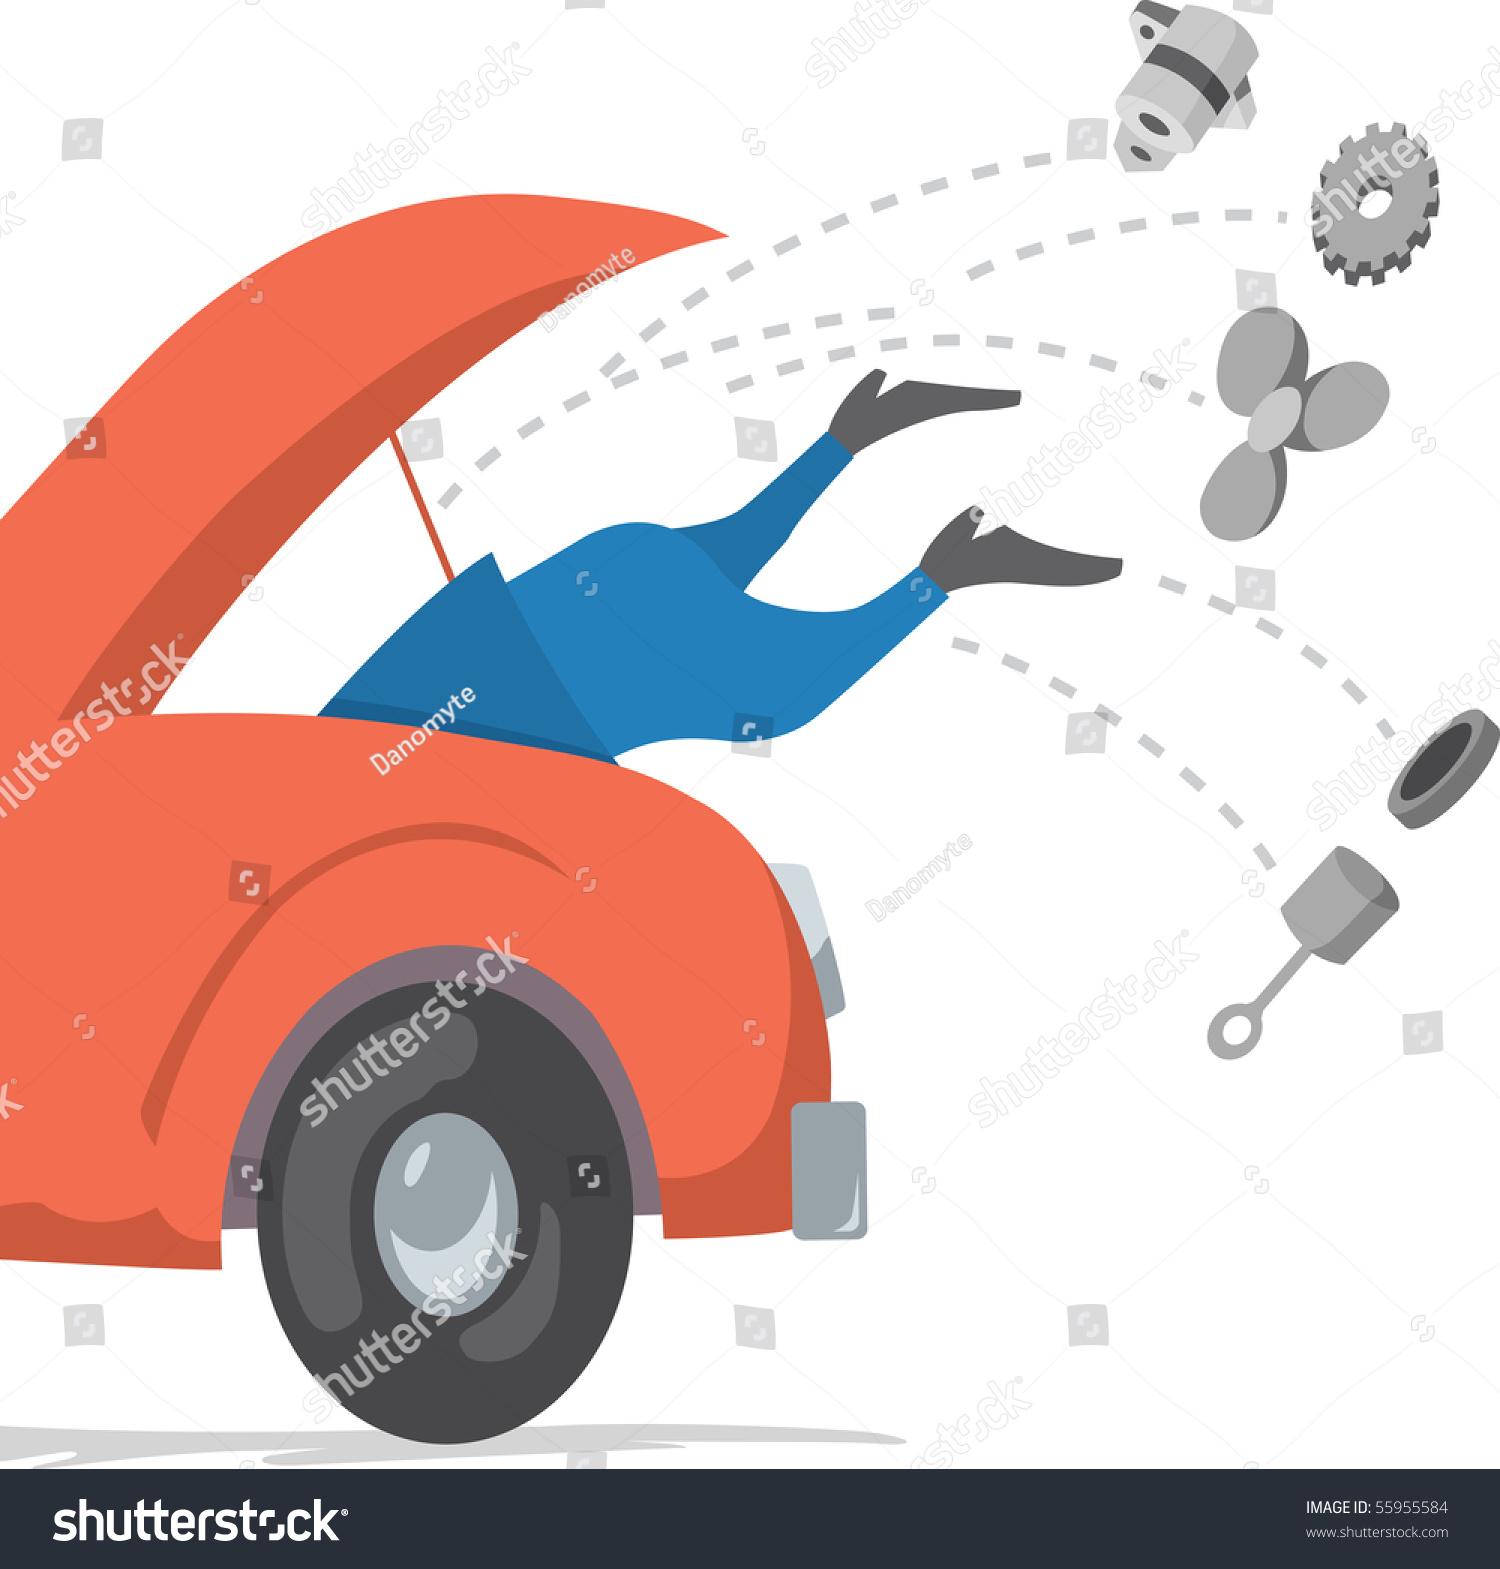 Man Under Hood, Attempting To Fix A Car. Stock Vector